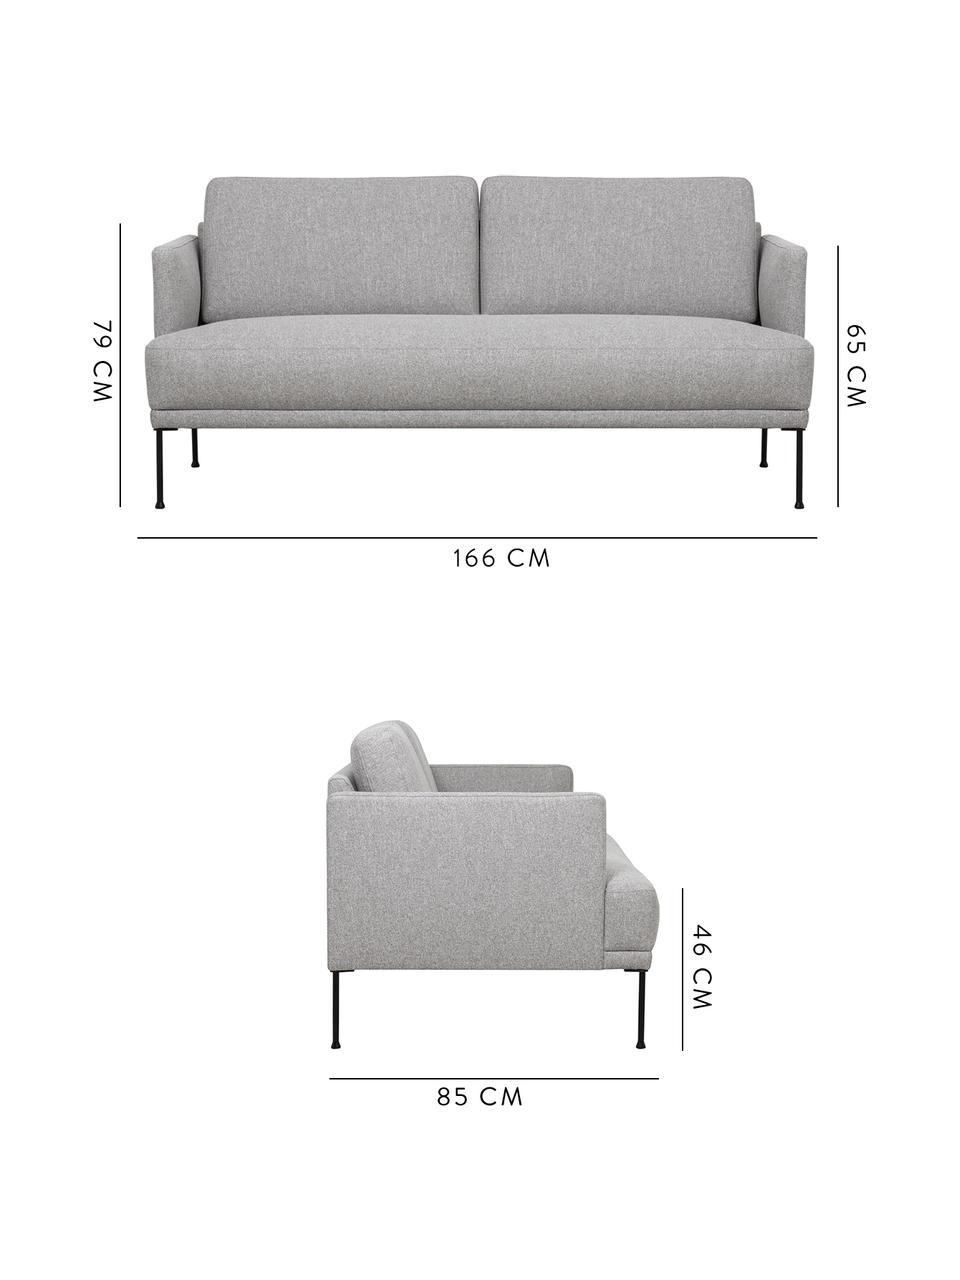 Canapé 2places tissu gris Fluente, Tissu gris clair